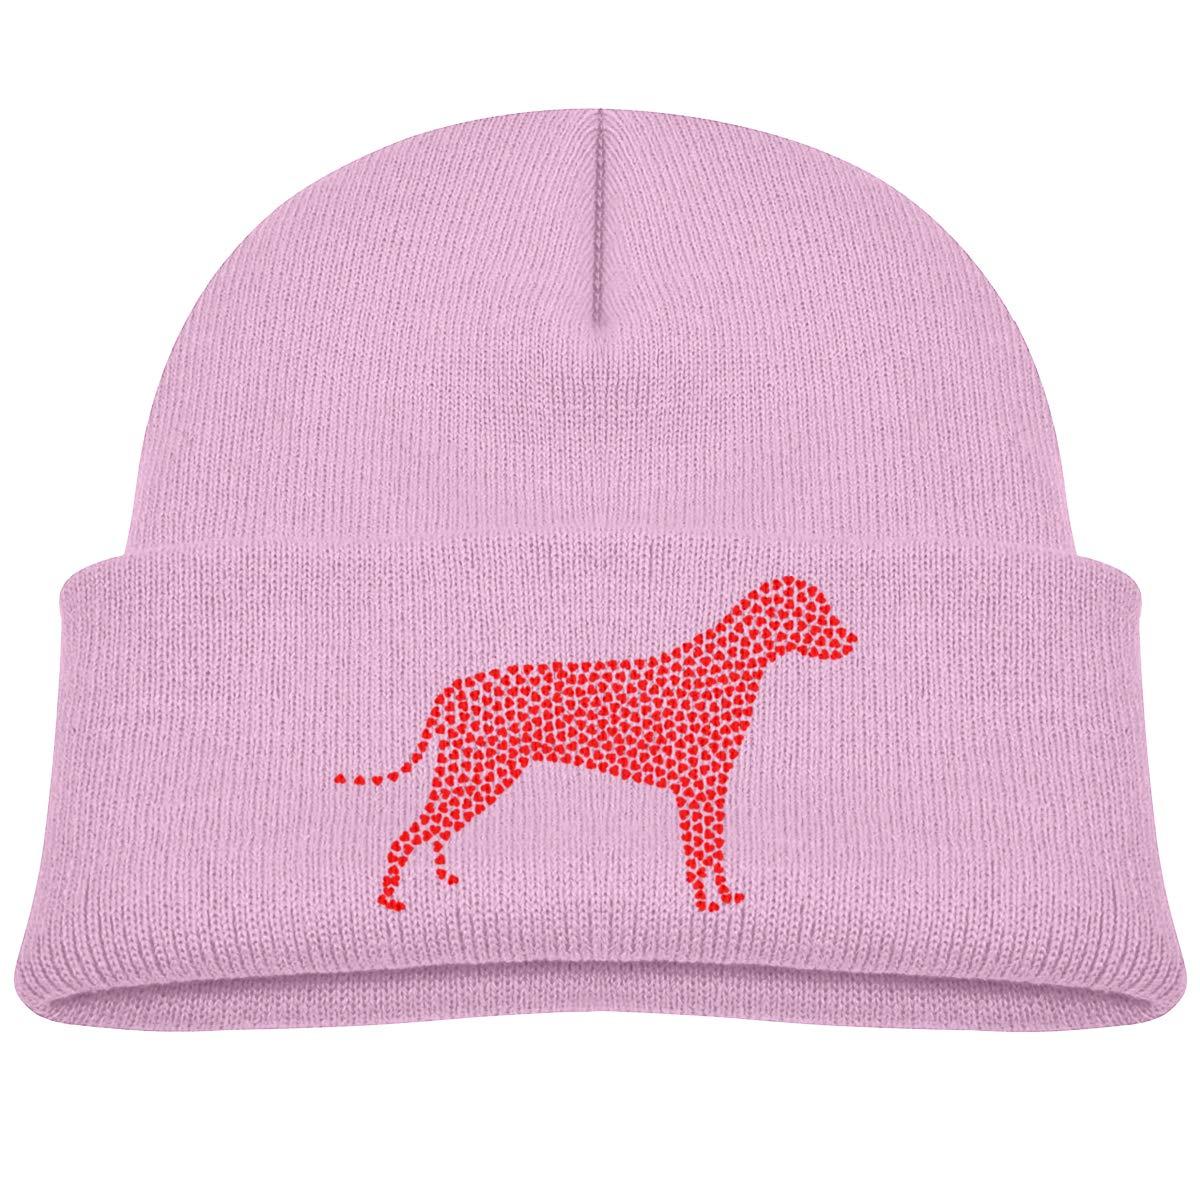 5c315e5bf7a Amazon.com  Red Heart Dog Paw Beanie Cap Skull Hat Baby Girl  Clothing